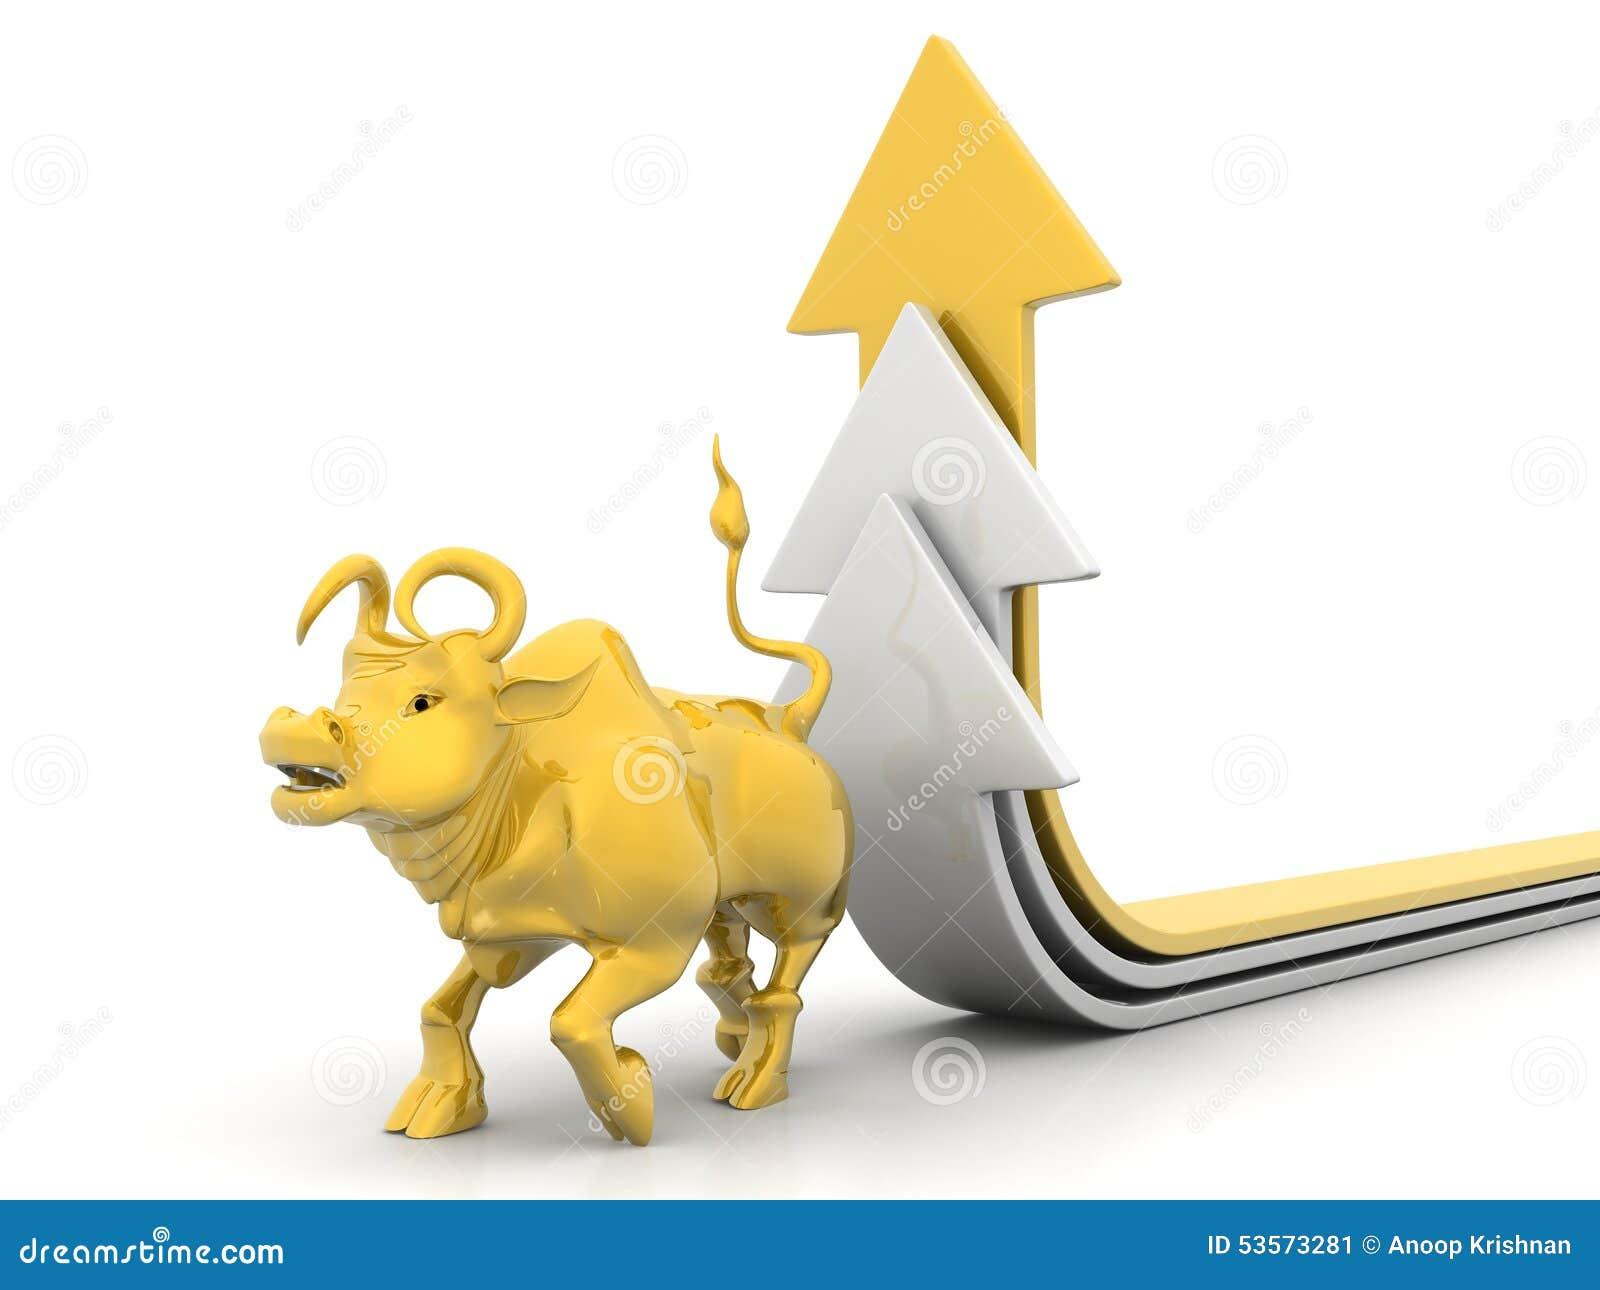 Growing Arrow With Bull